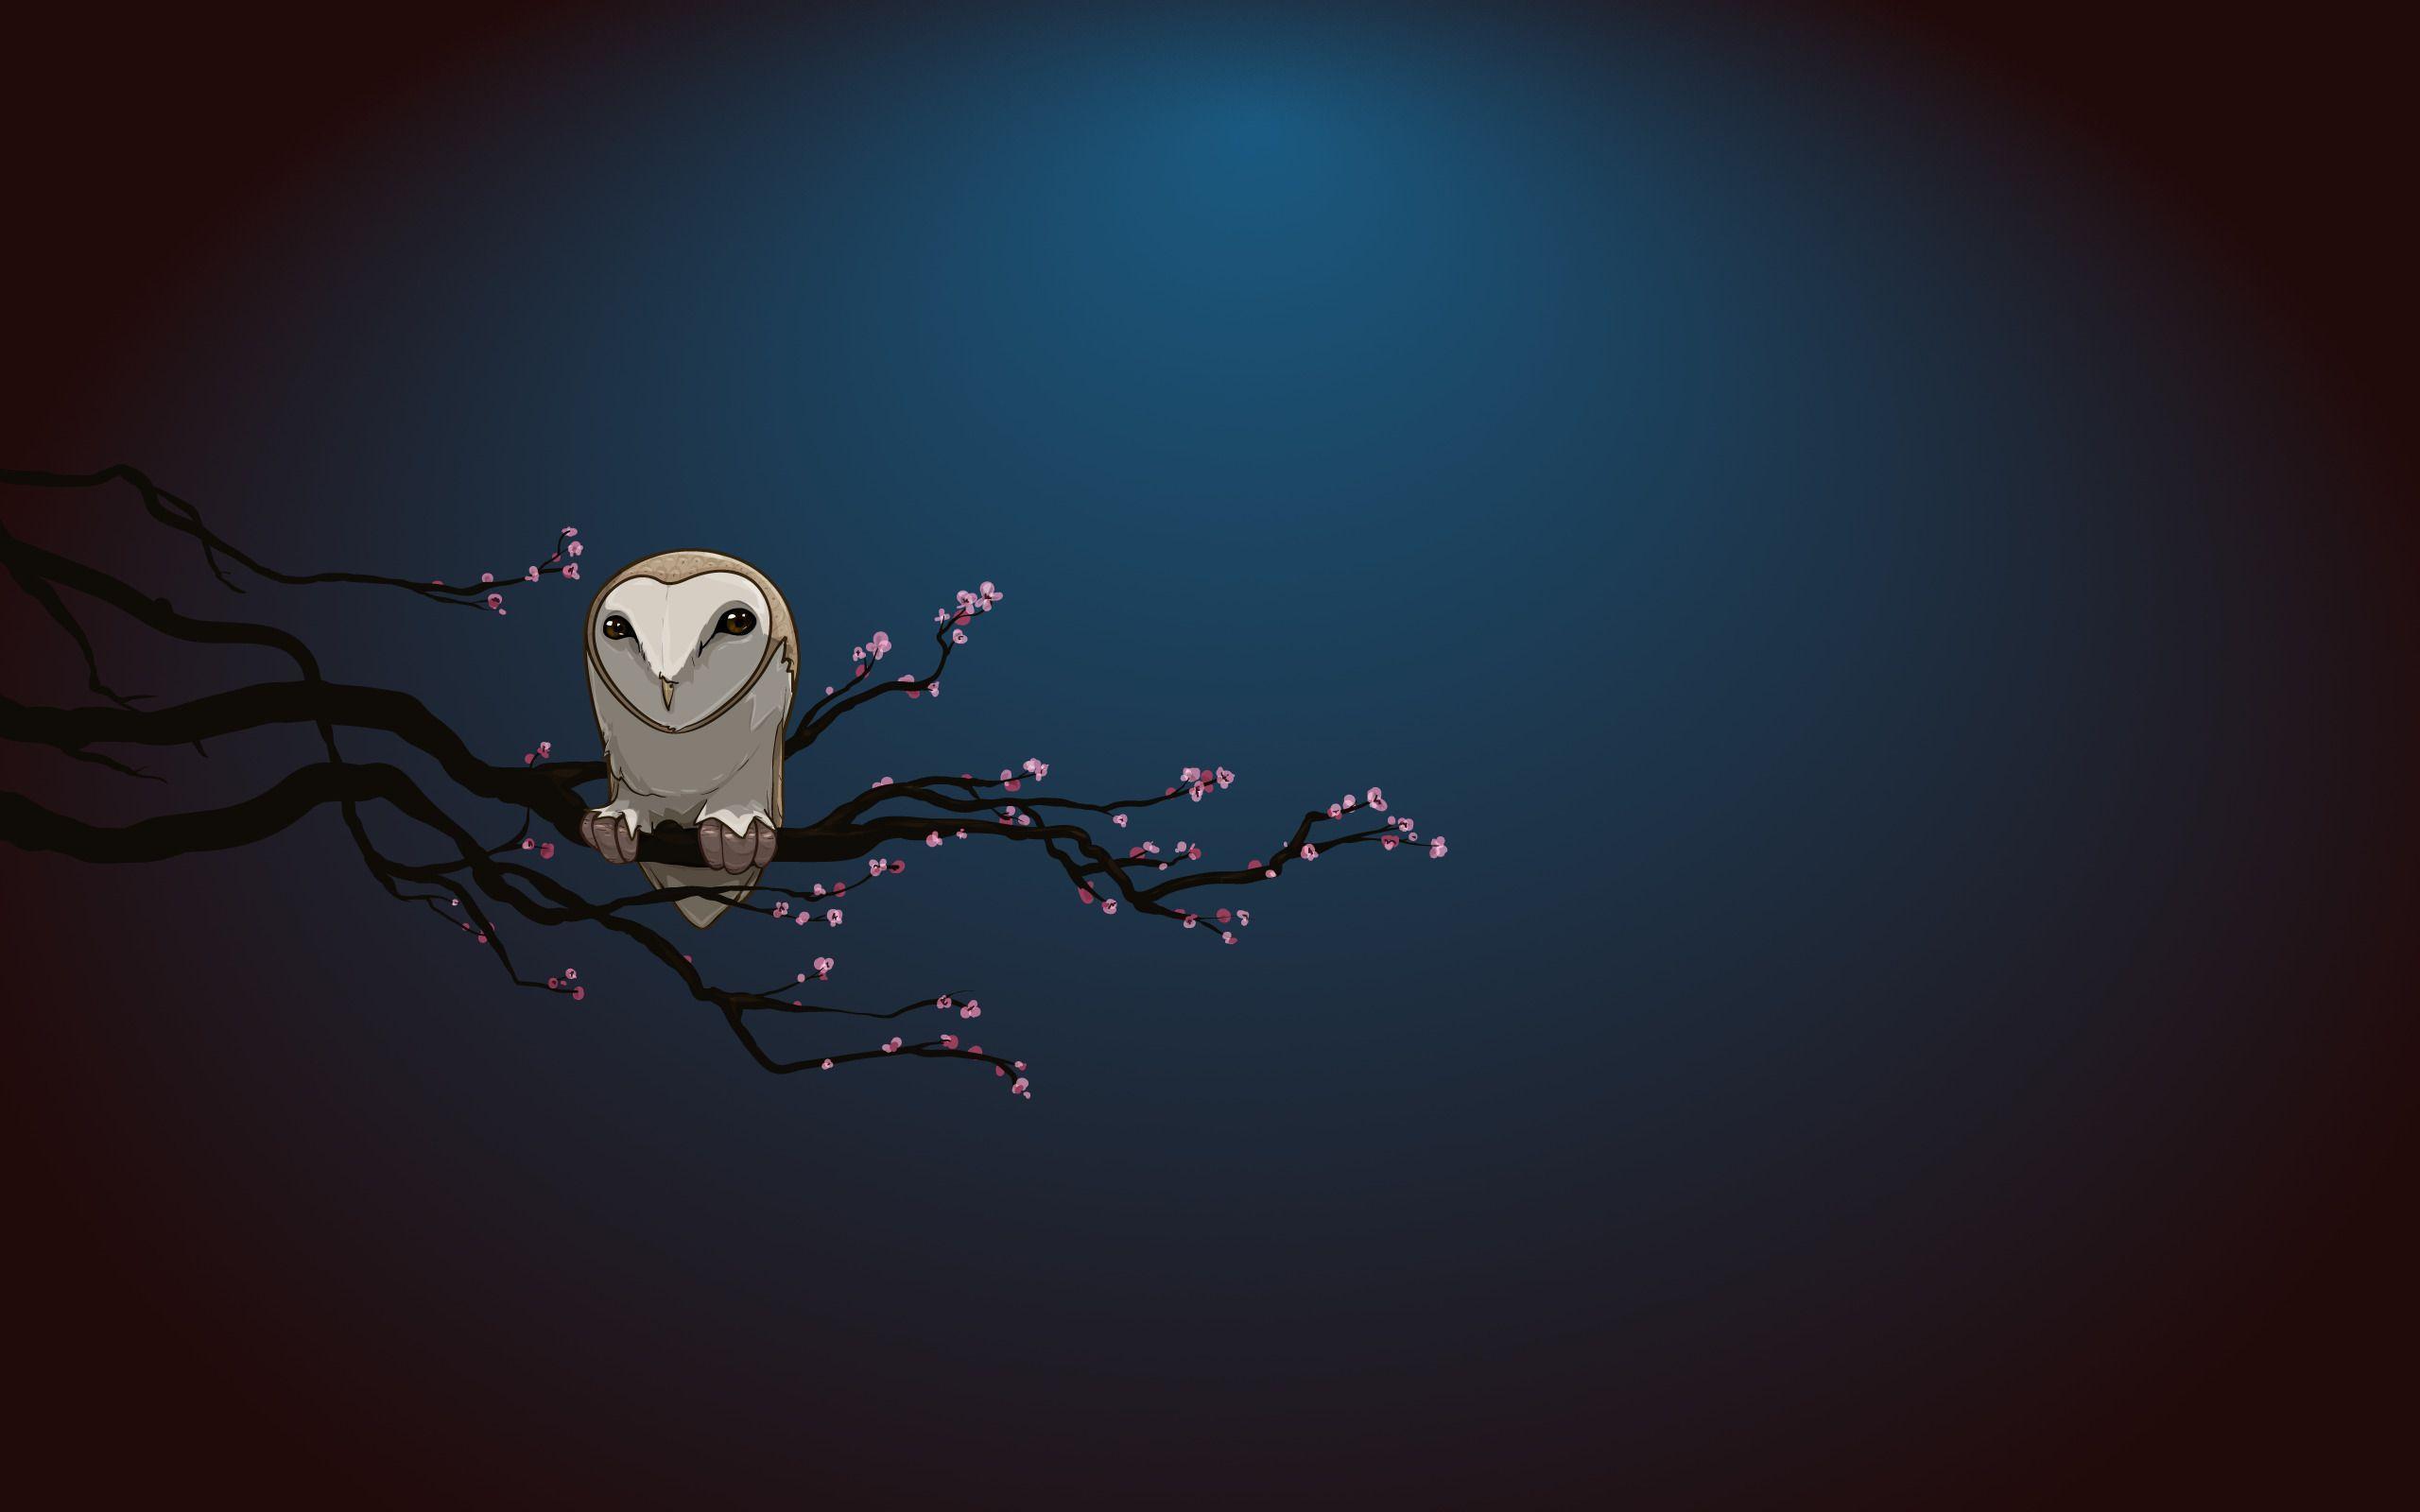 Owl Desktop Wallpapers - Wallpaper Cave  Owl Desktop Wal...